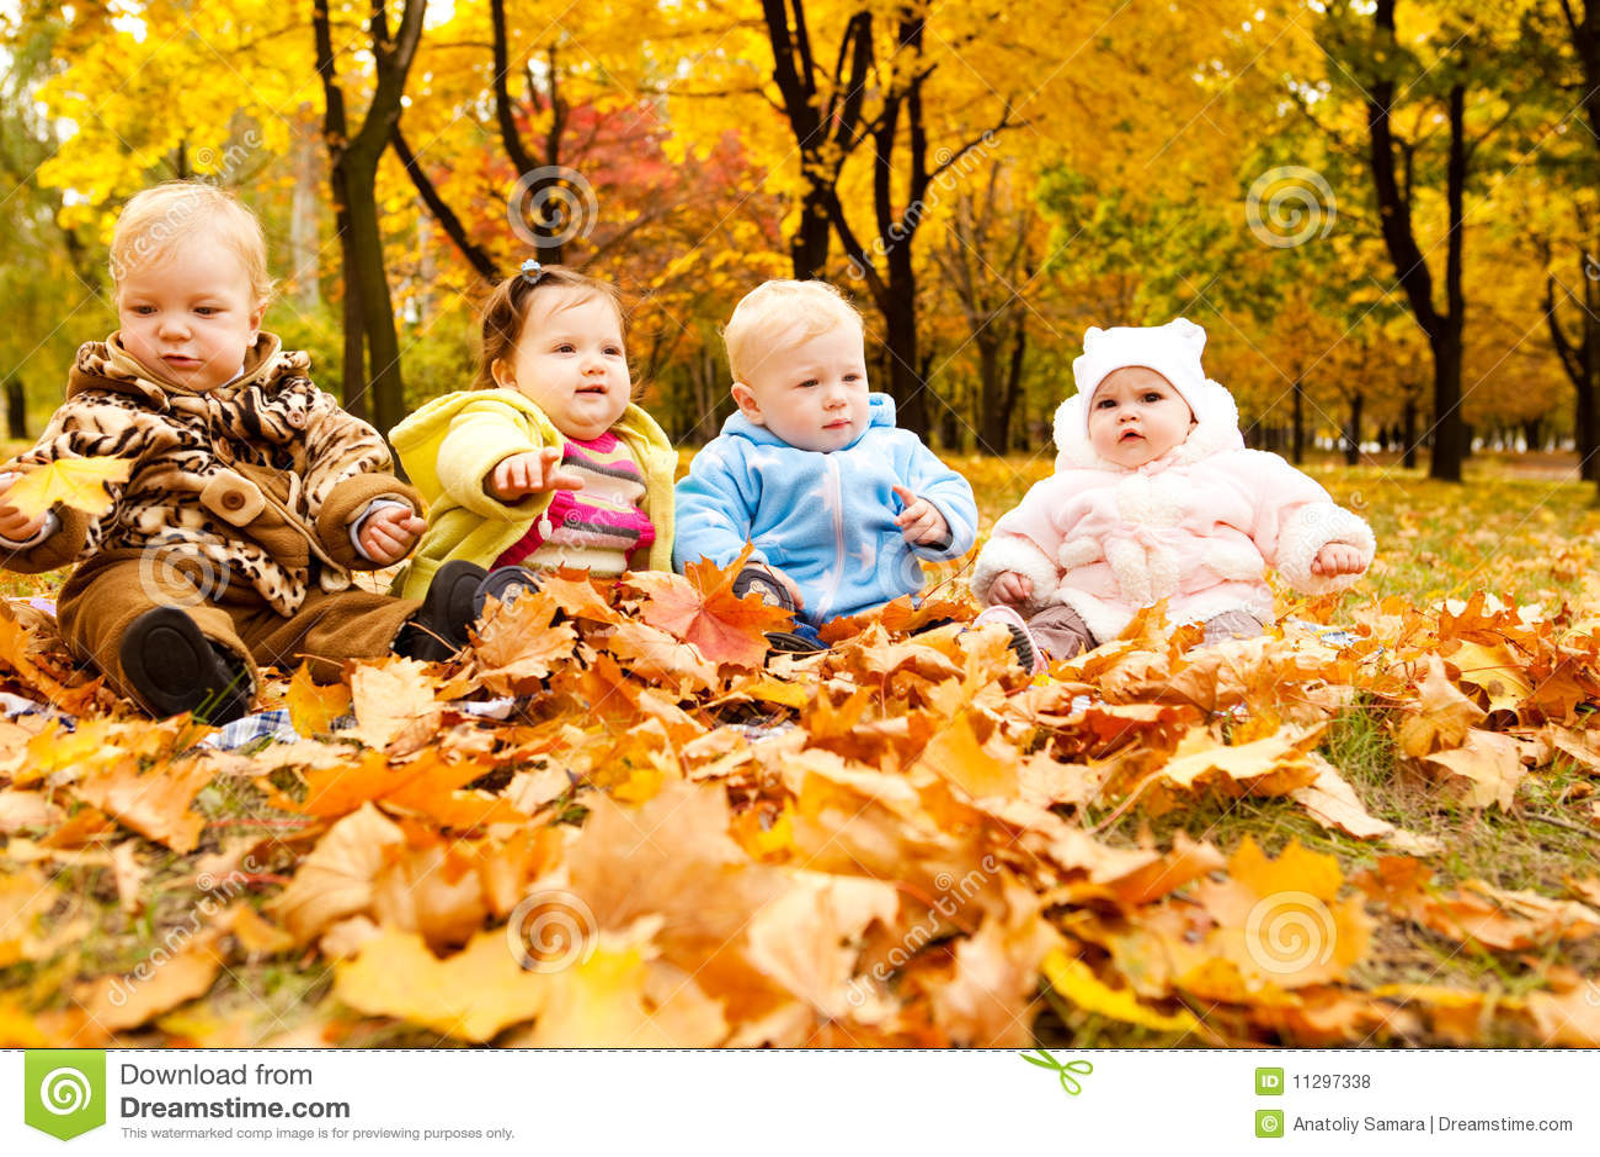 Pretty Little Girl Wallpaper Autumn Babies Royalty Free Stock Photos Image 11297338